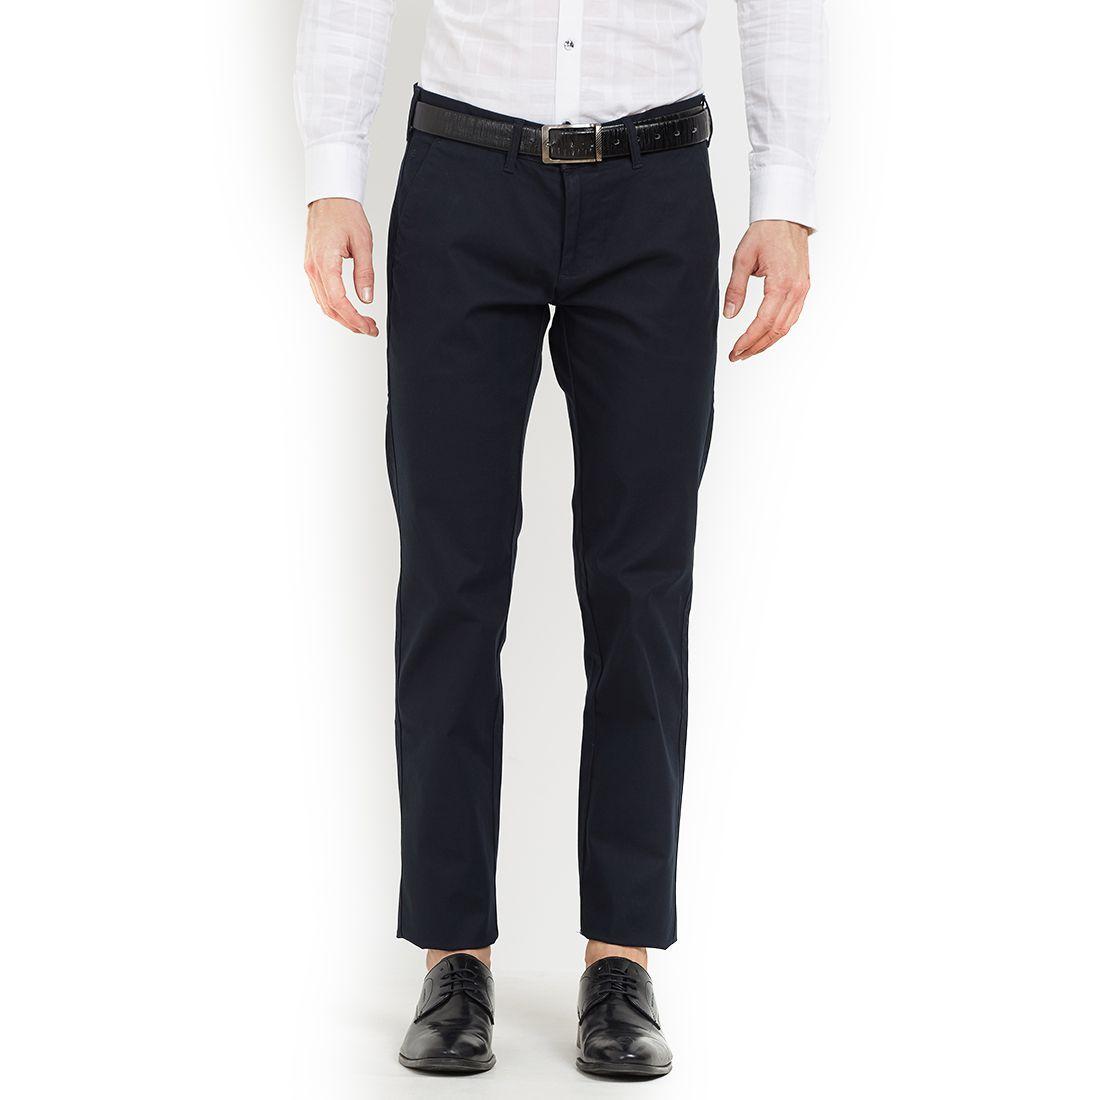 EASIES by KILLER Blue Regular -Fit Flat Trousers